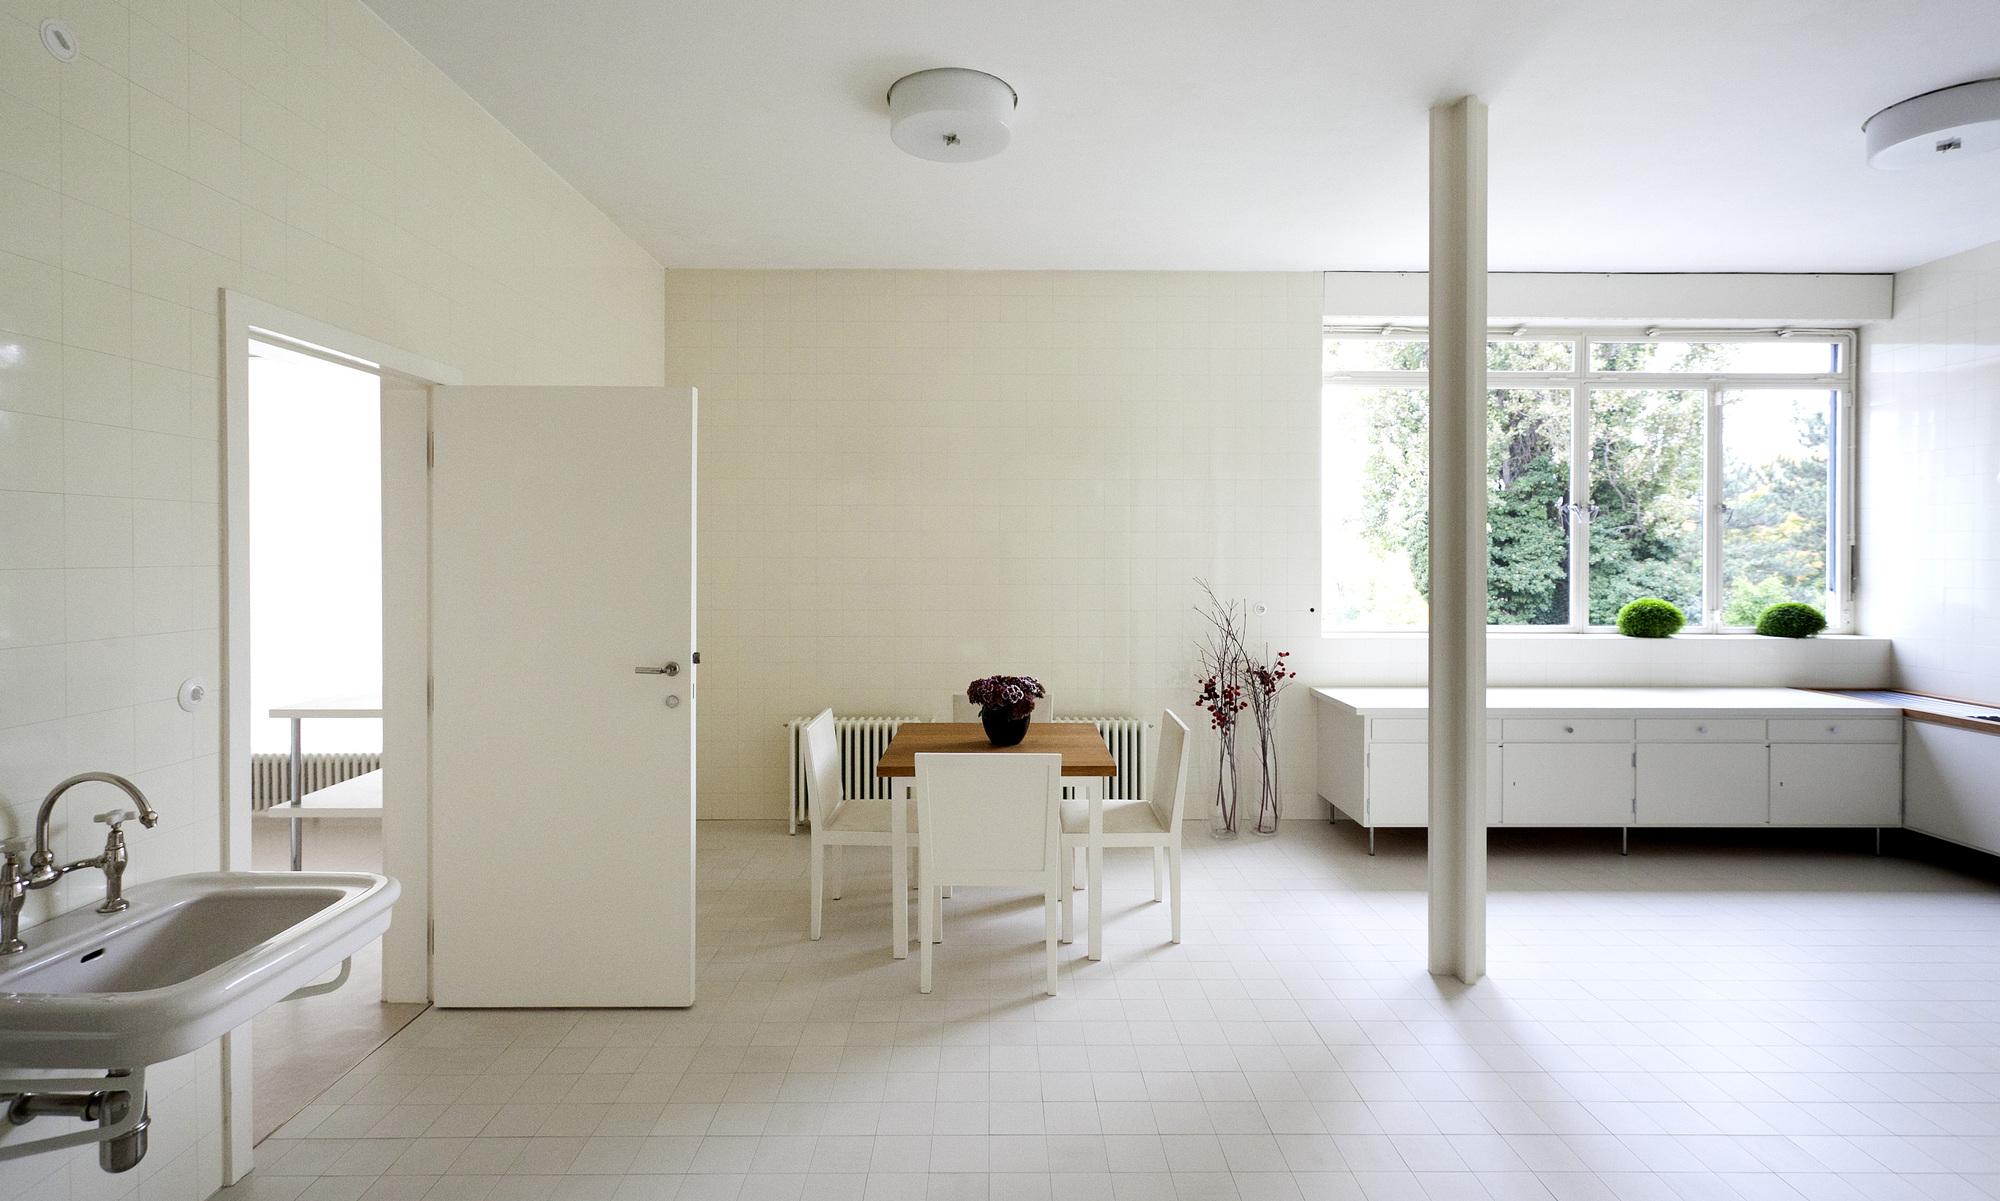 gallery of ad classics villa tugendhat mies van der rohe 21. Black Bedroom Furniture Sets. Home Design Ideas